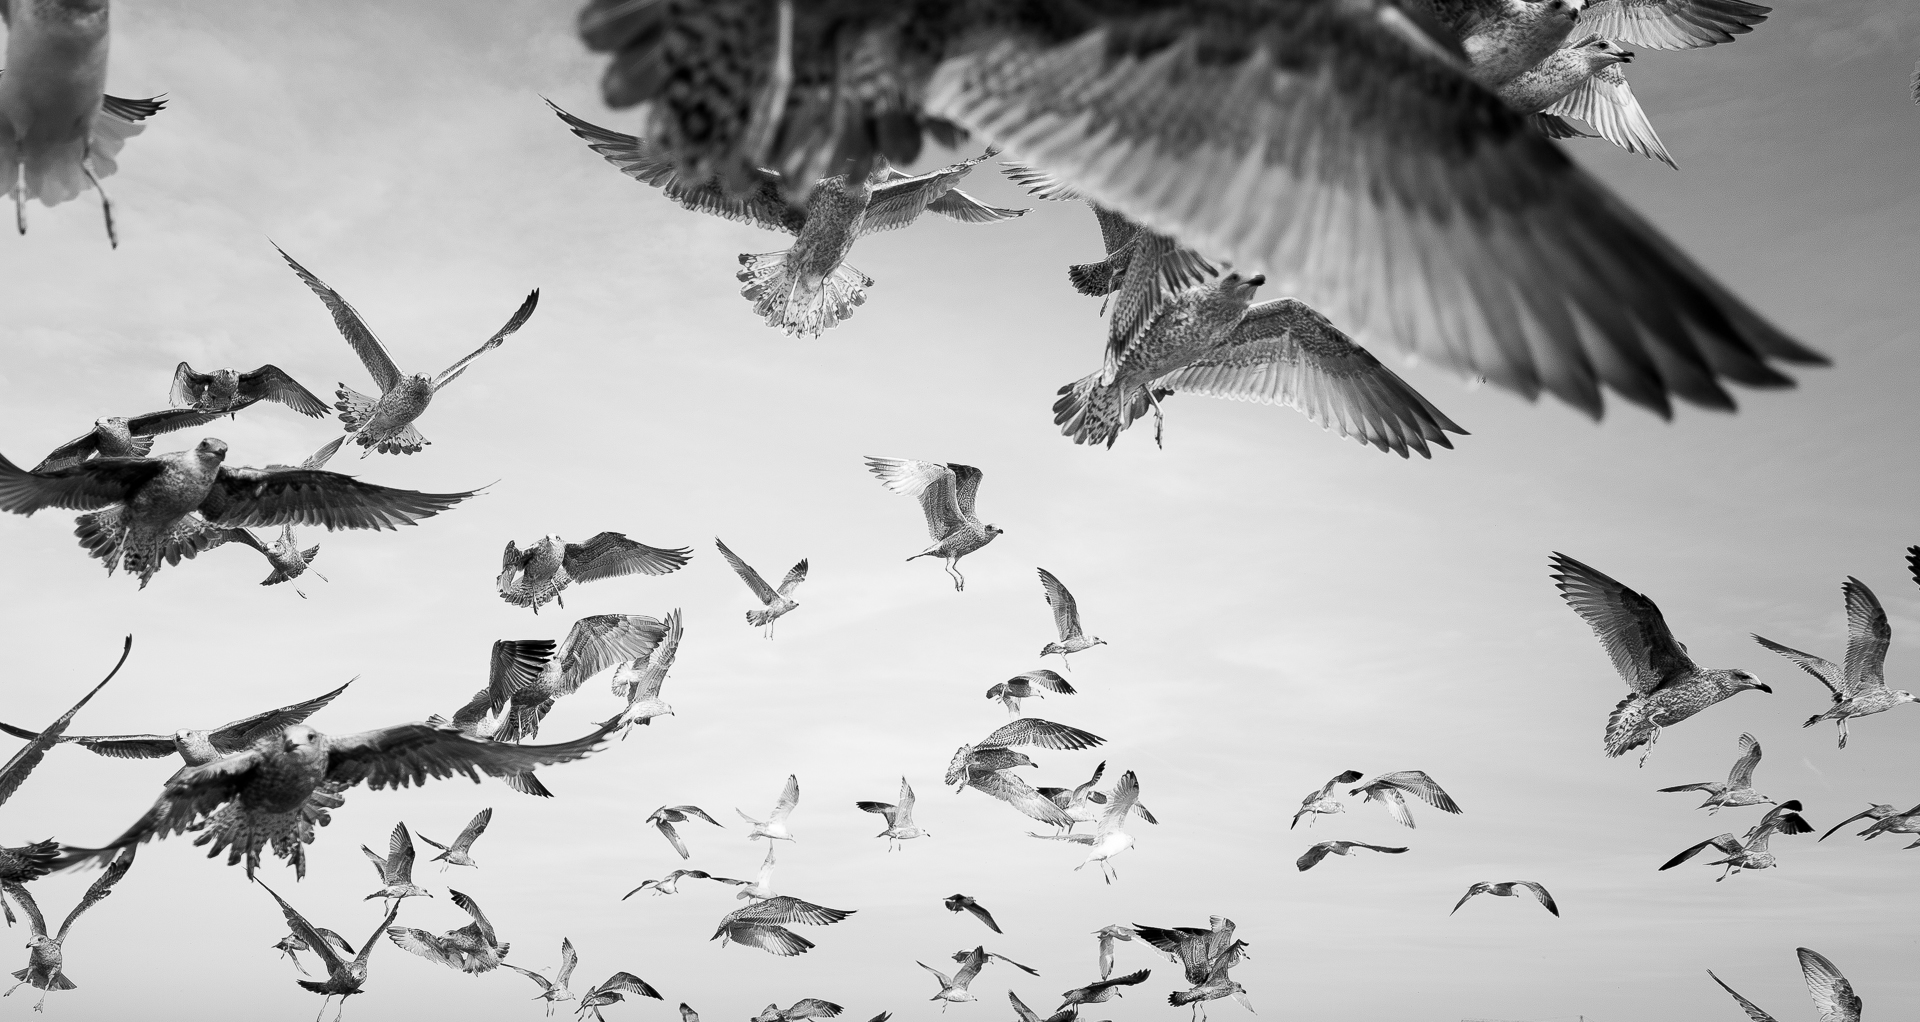 A sky full of enthousiastic seagulls